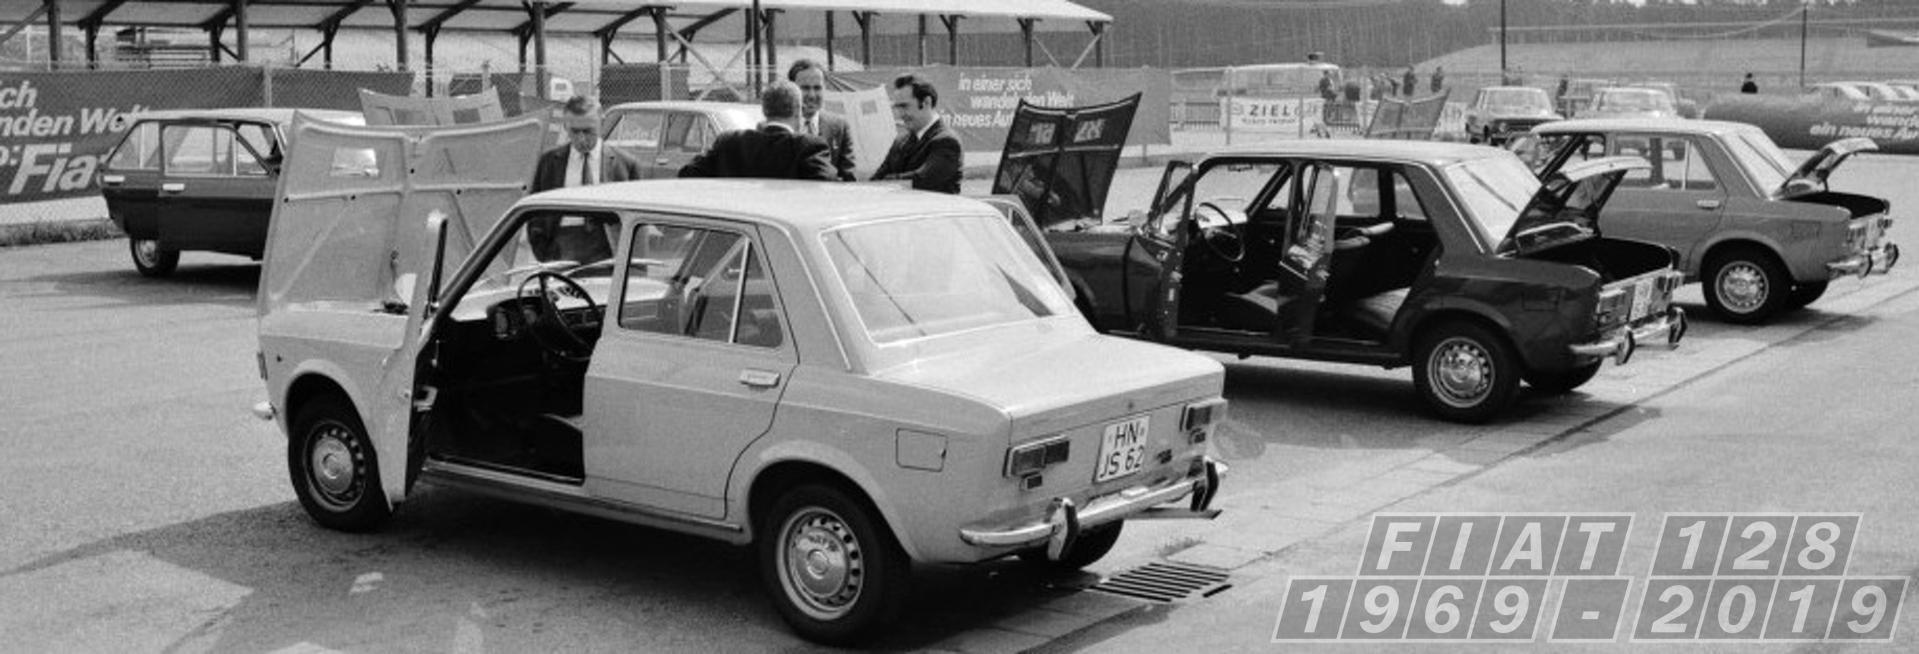 1969_08_28_CarsParkedatHockenheim_2-2_vz_2019-04-01.jpg